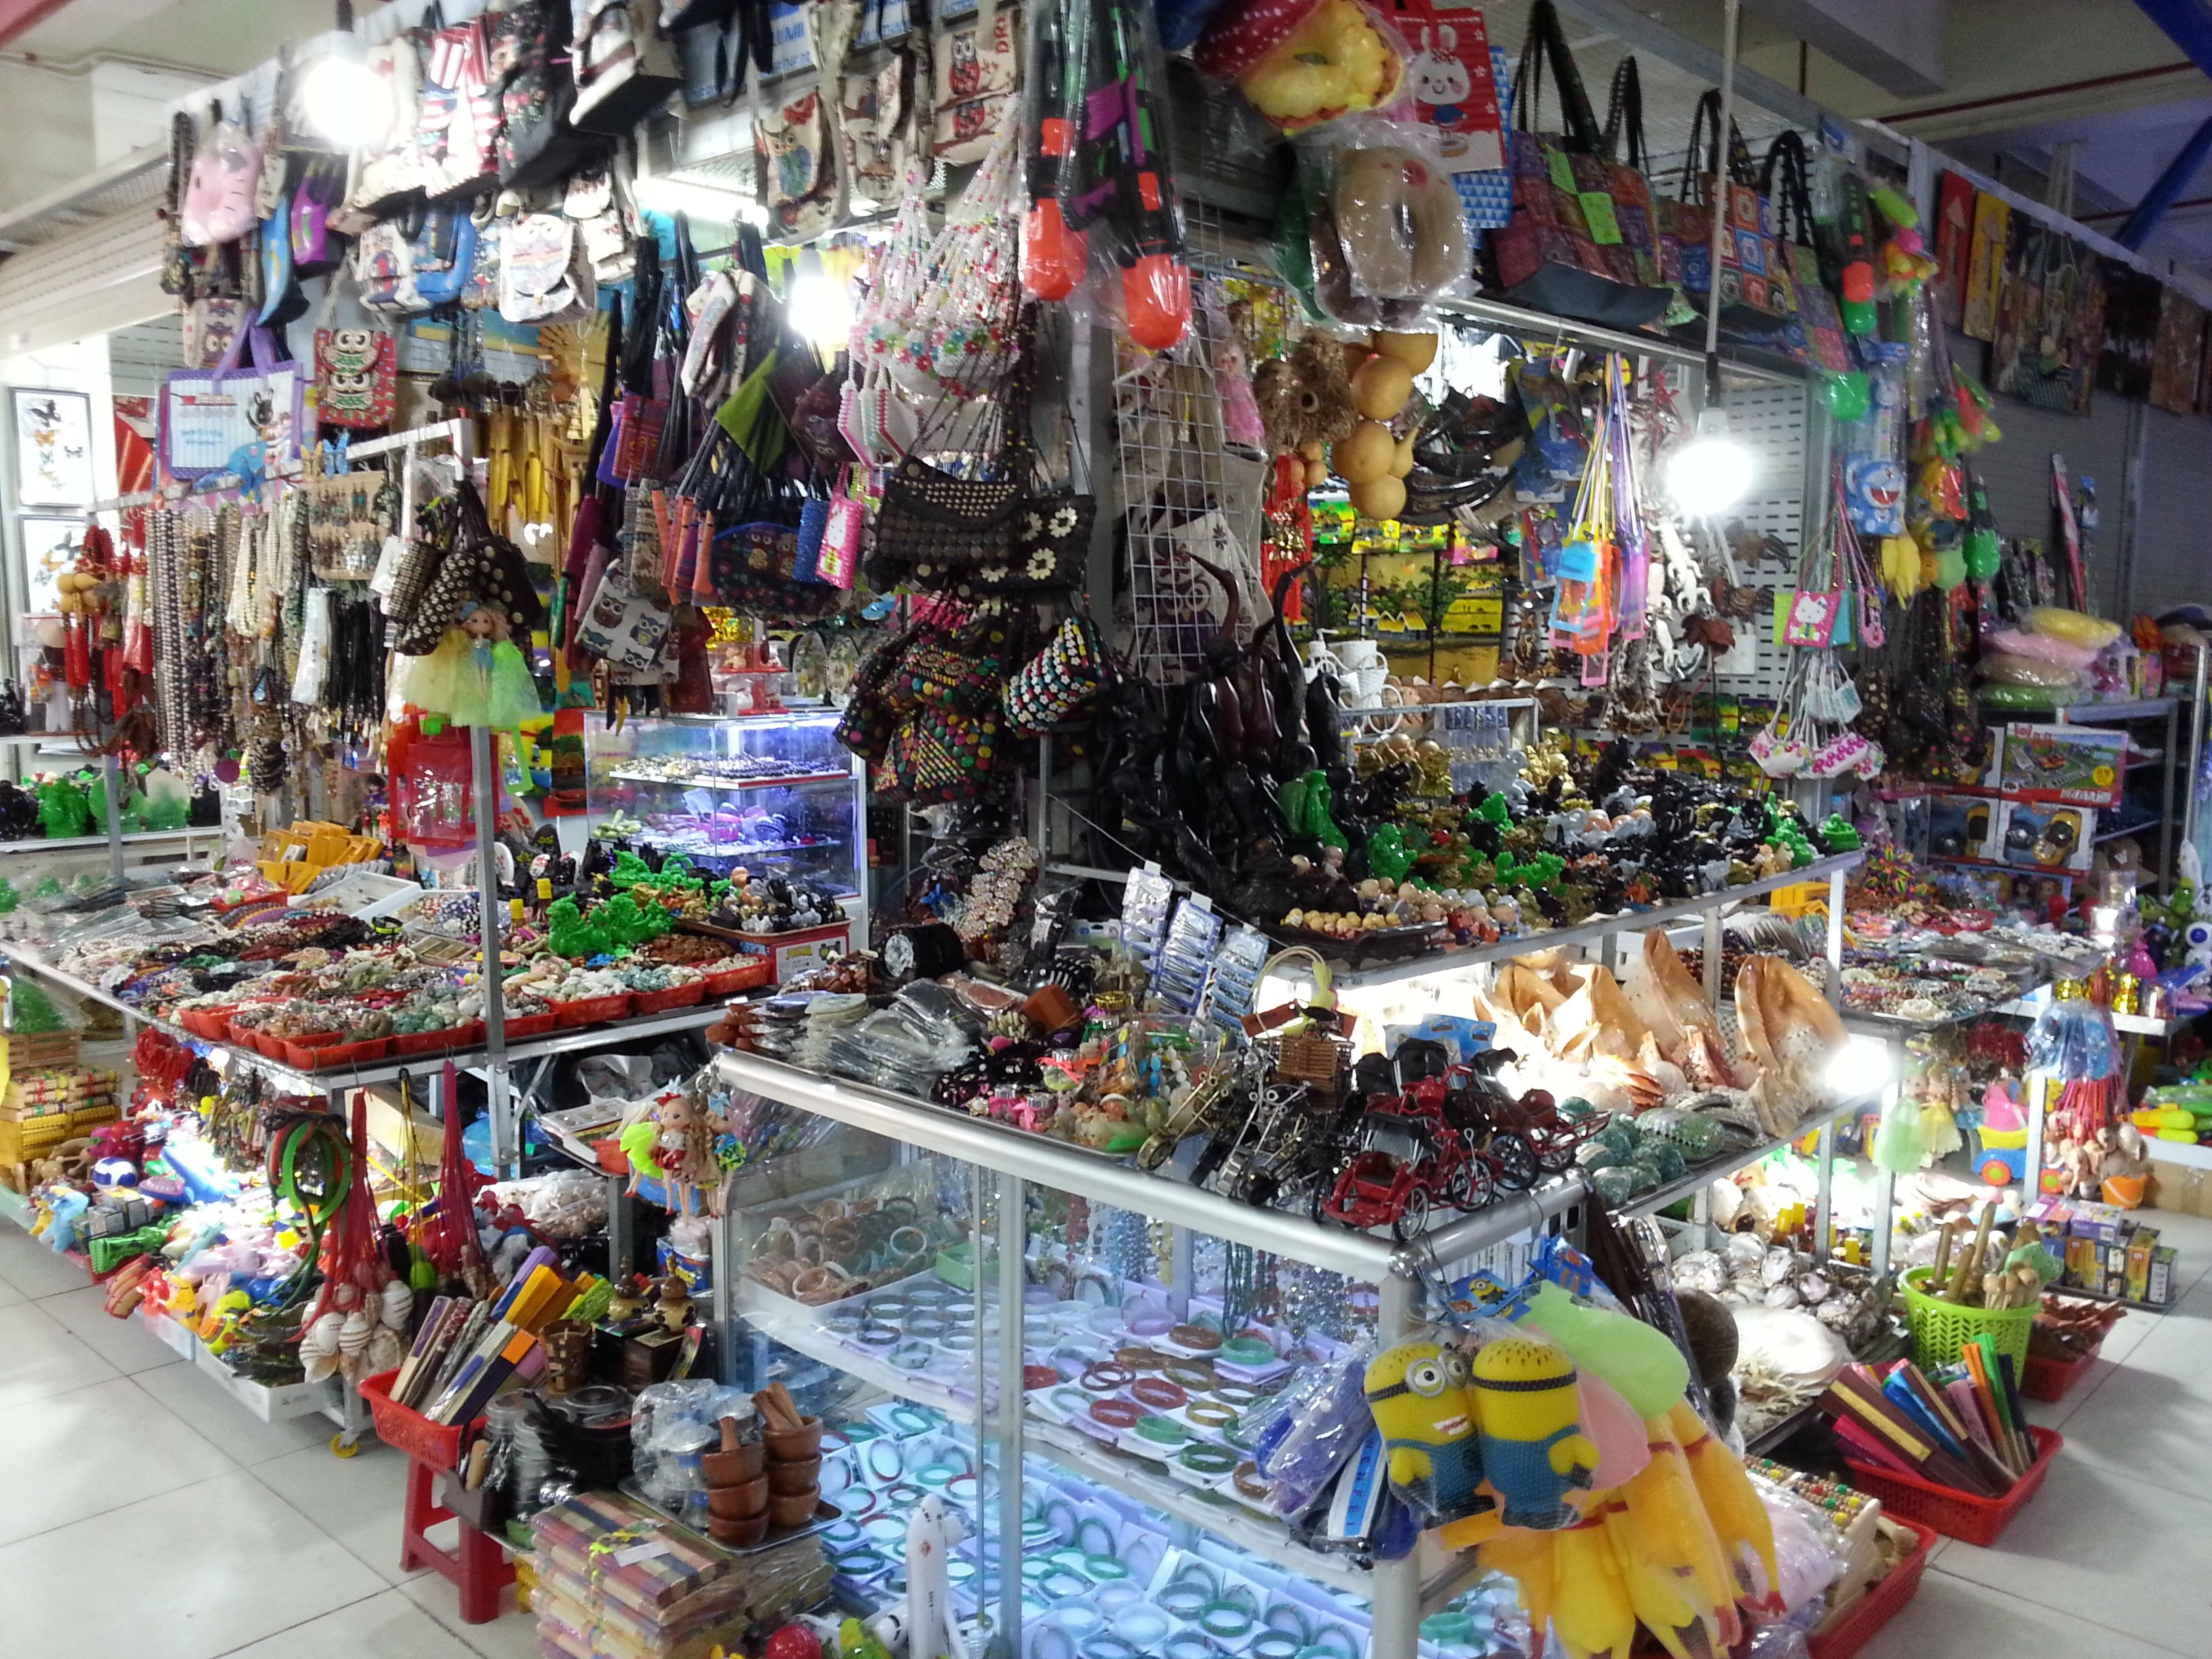 Toys and souvenirs at the food market in Nha Trang